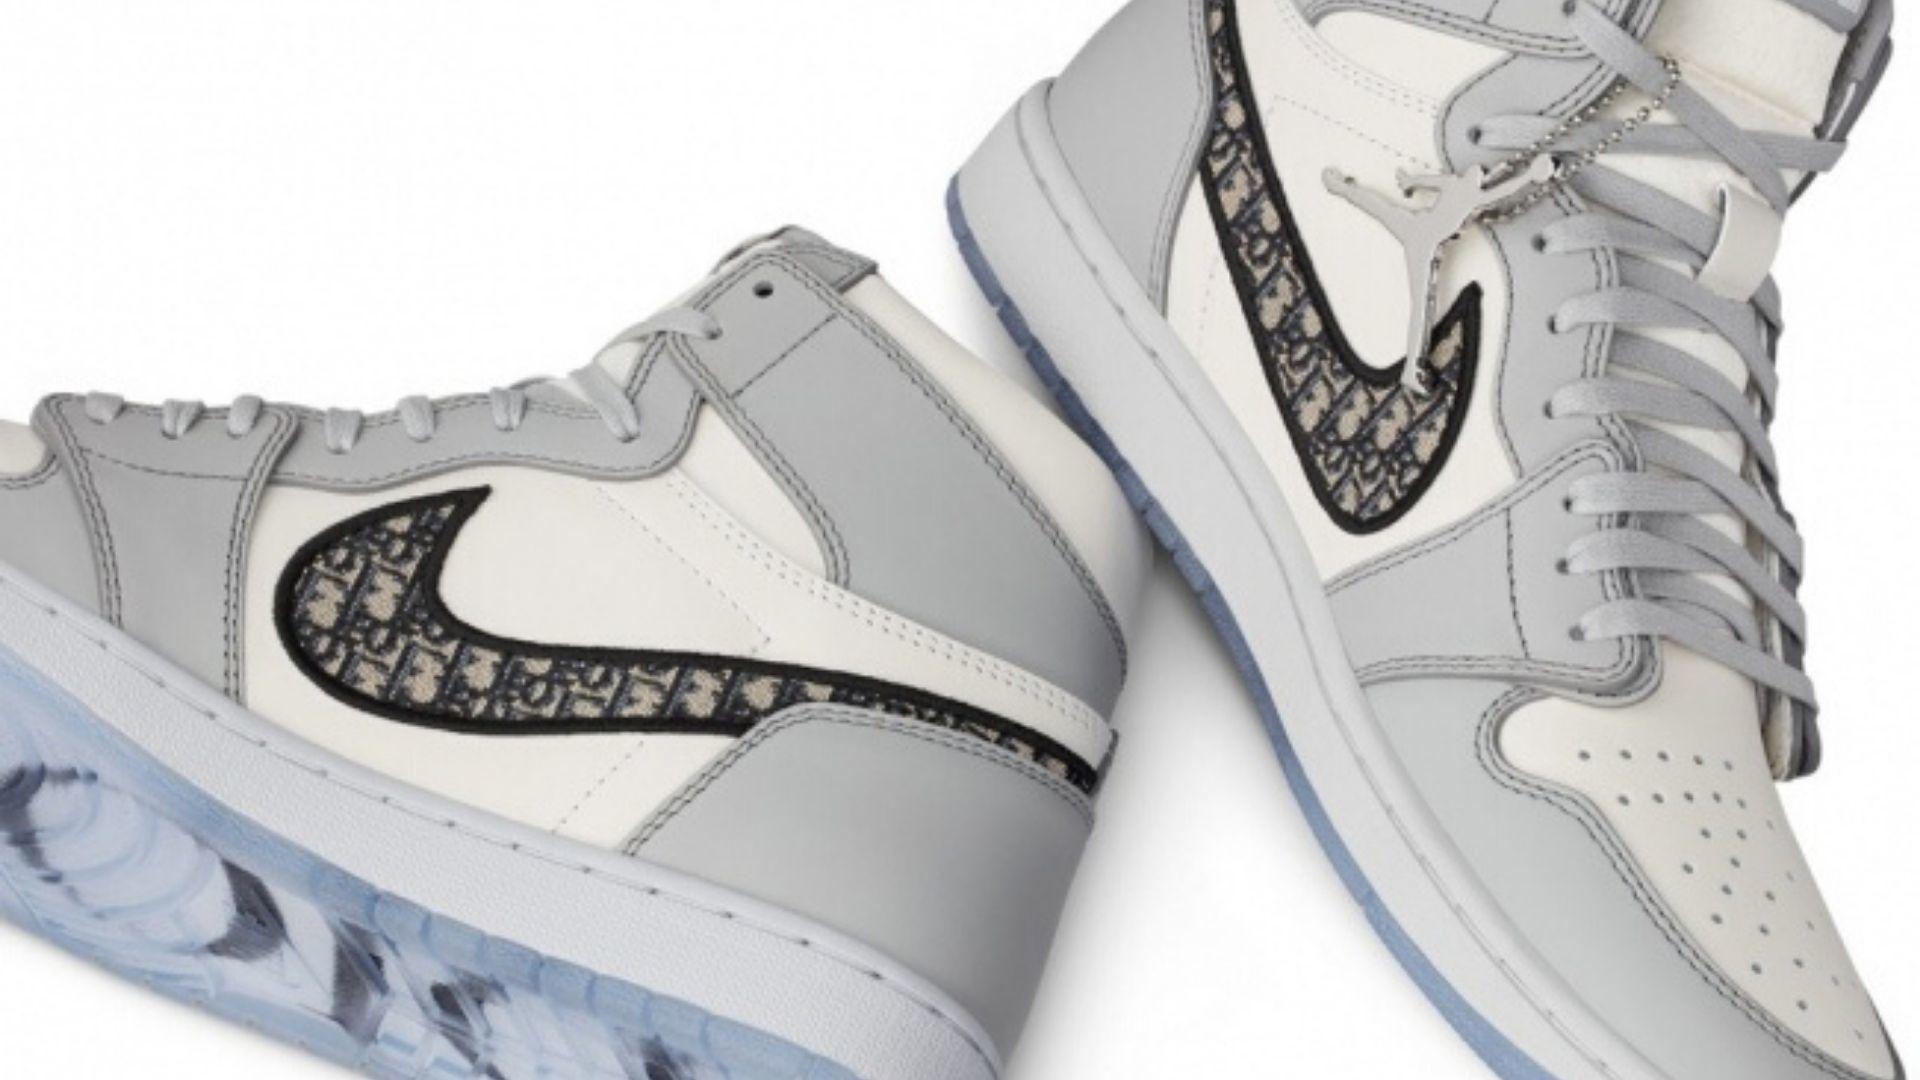 Dior Collaborates With Air Jordan On Air Dior Sneakers